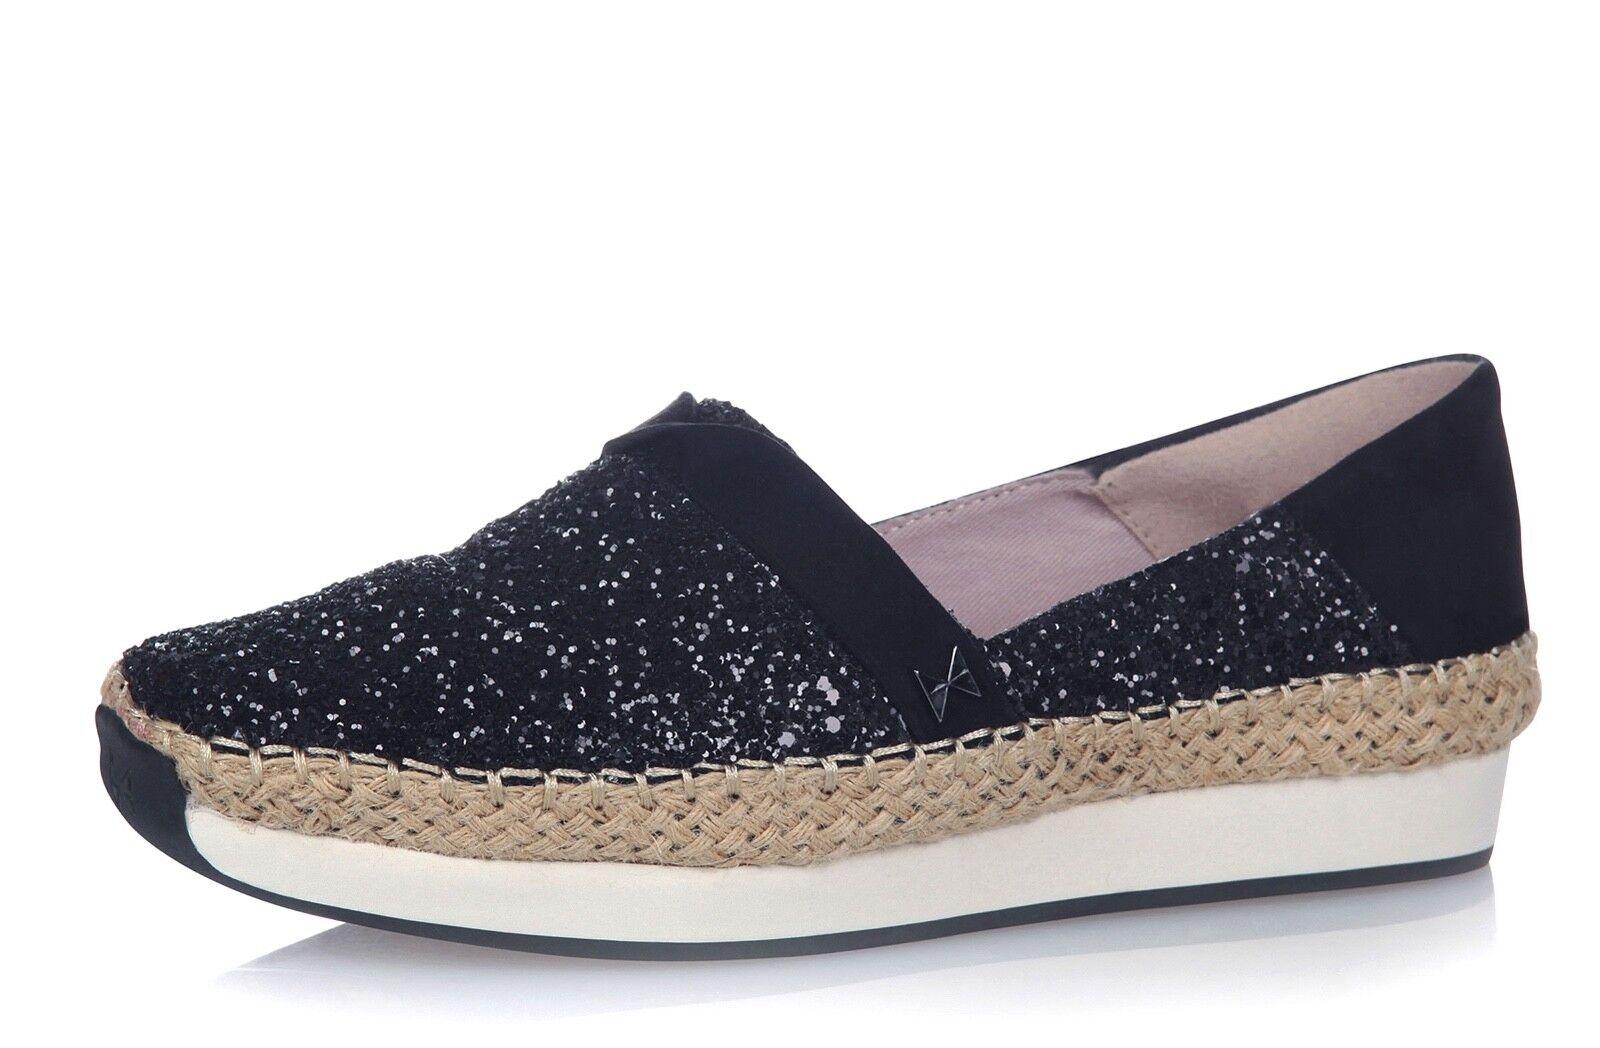 Butterfly Twists NEW Maya black glitter suede platform espadrille shoes size 3-9